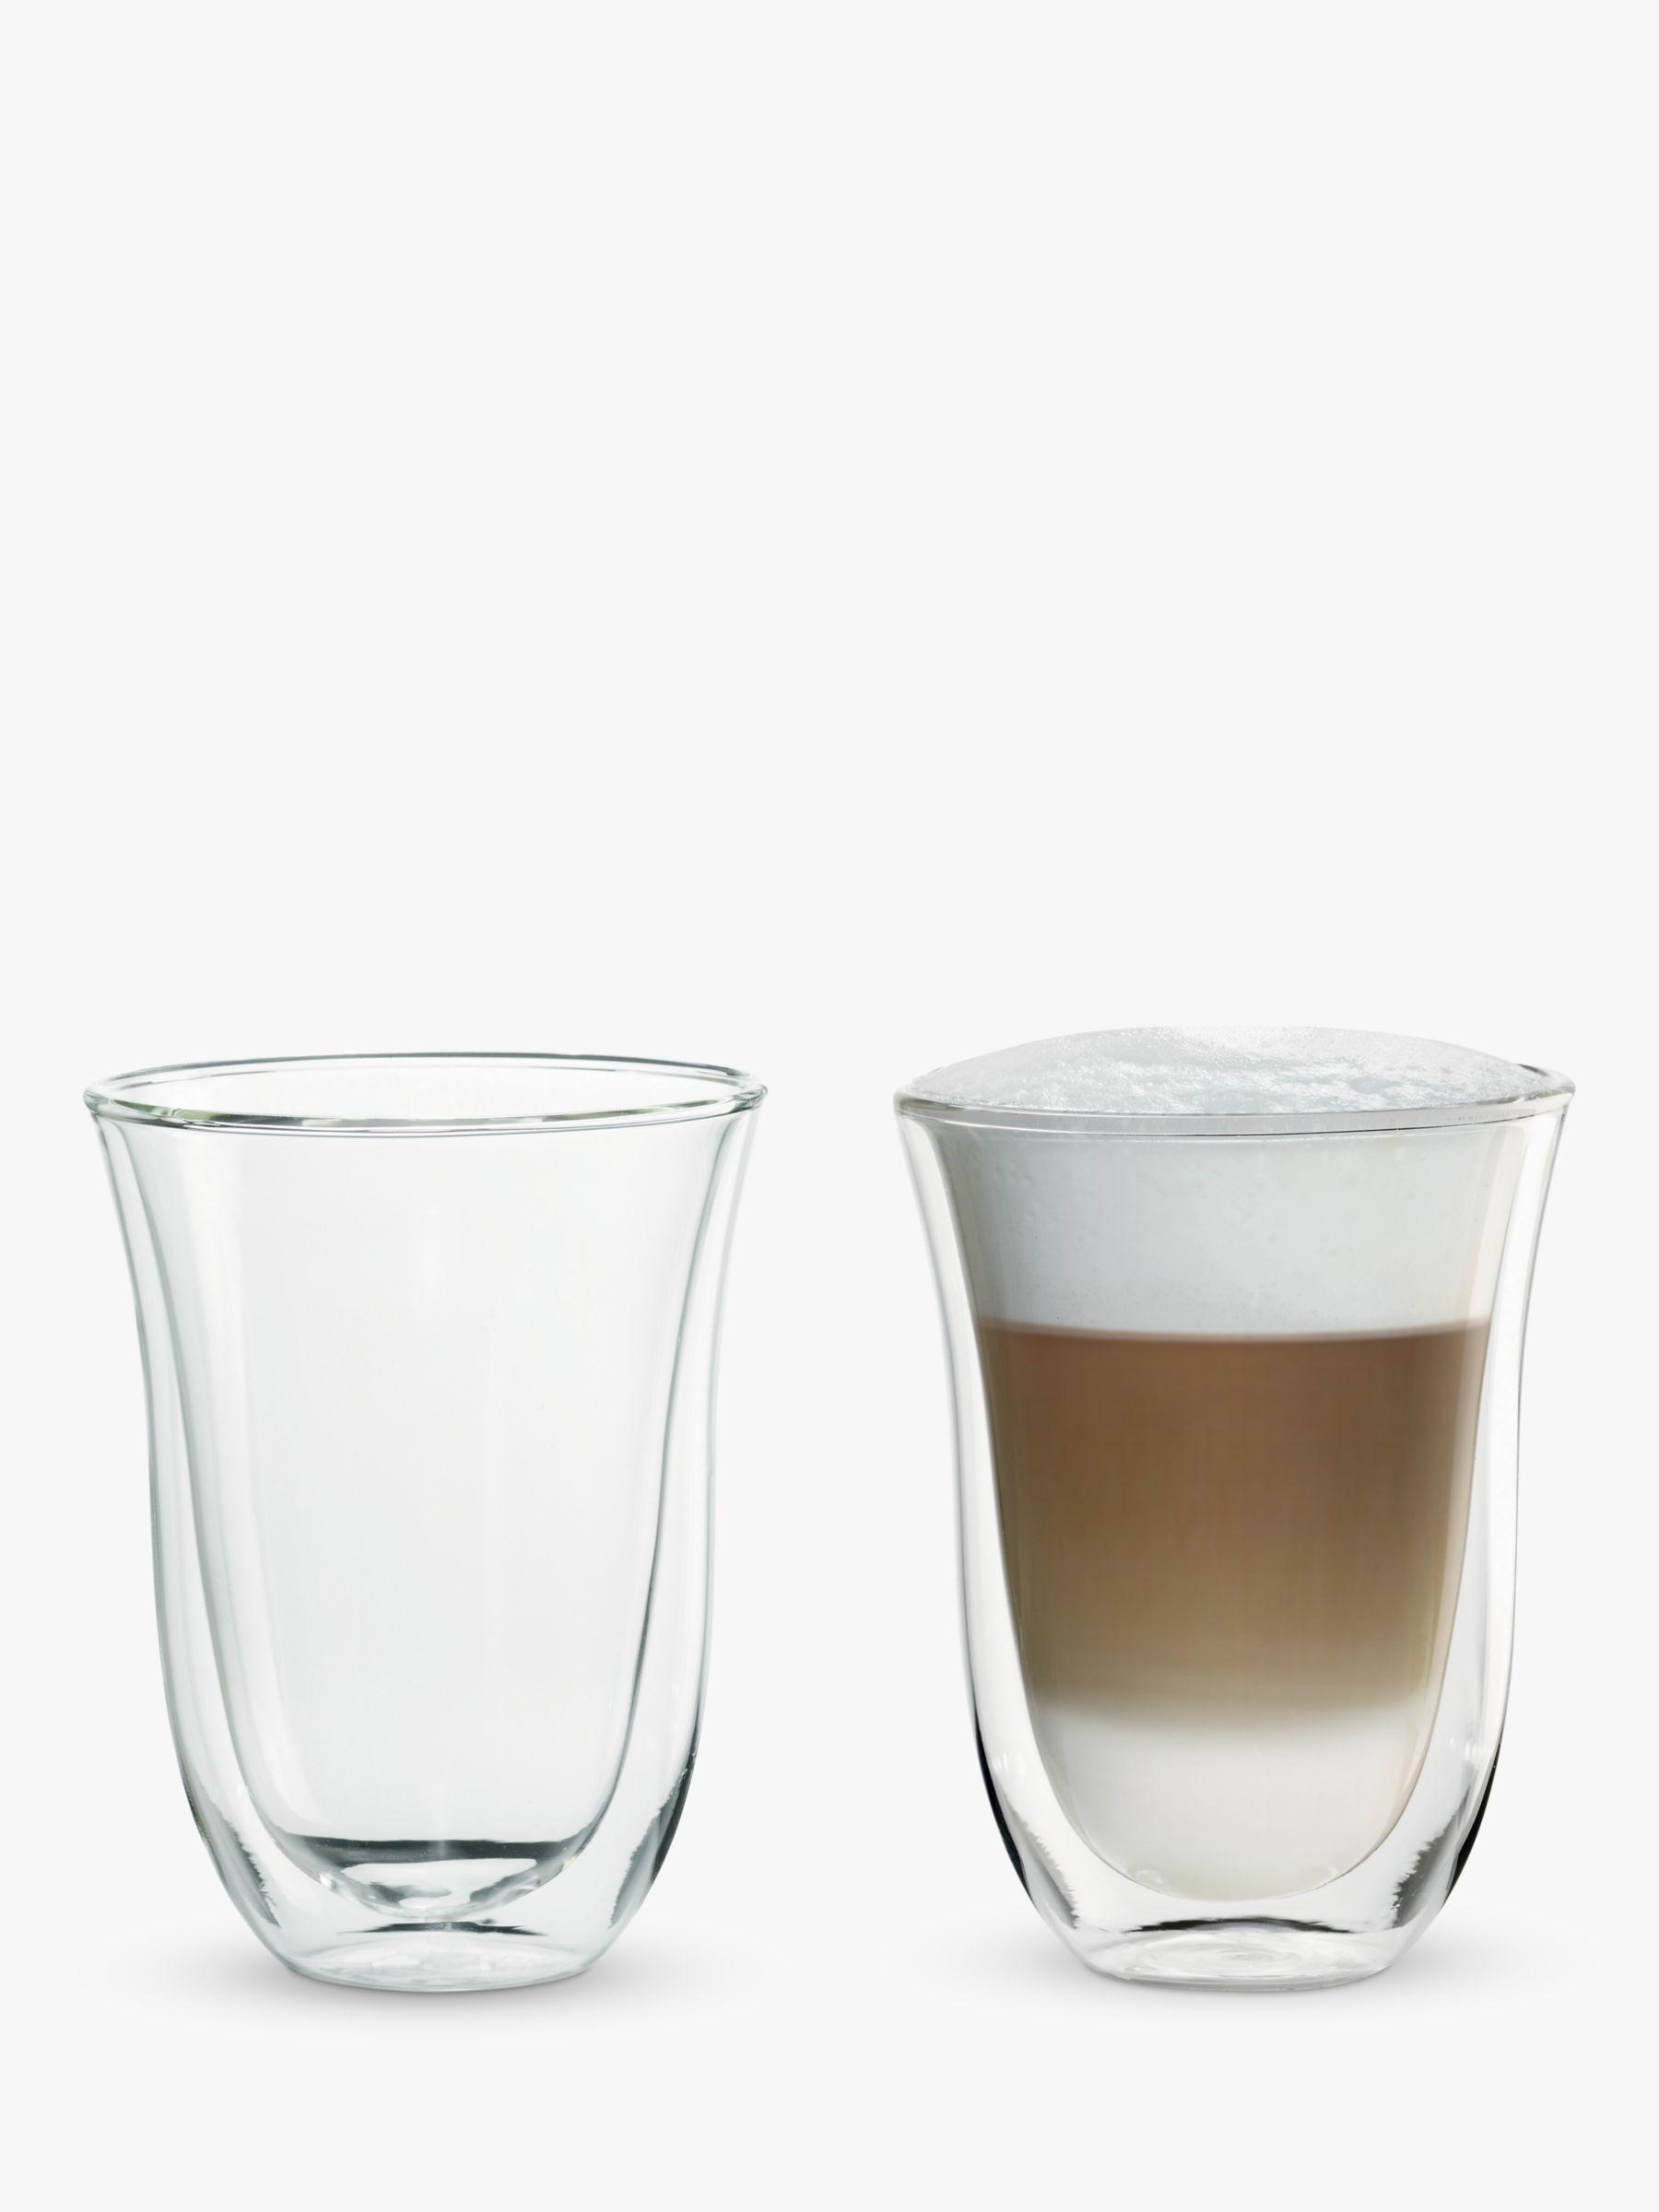 Delonghi De'Longhi Latte Macchiato Glasses, Set of 2